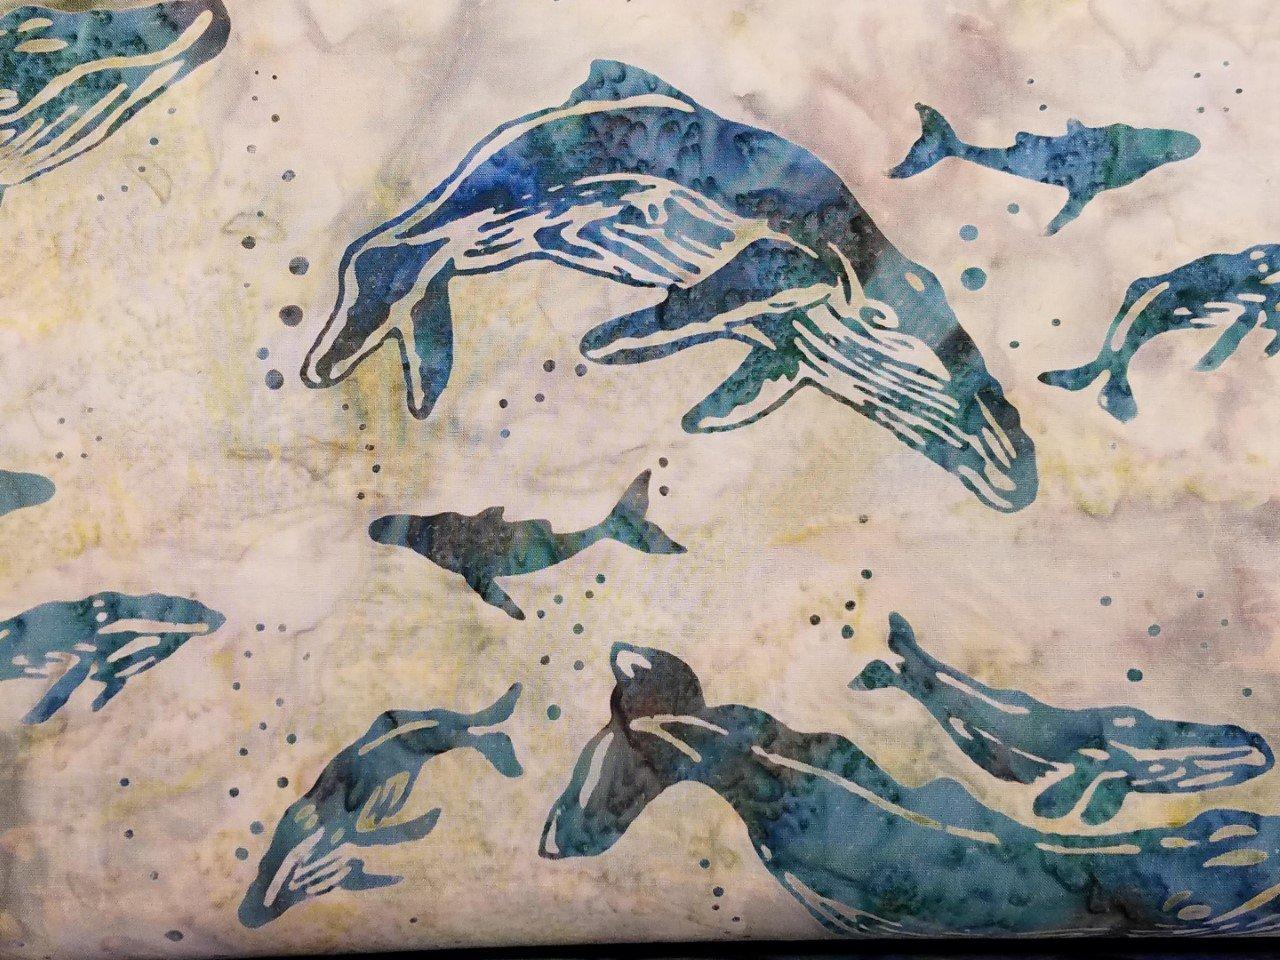 Whales H2282-106